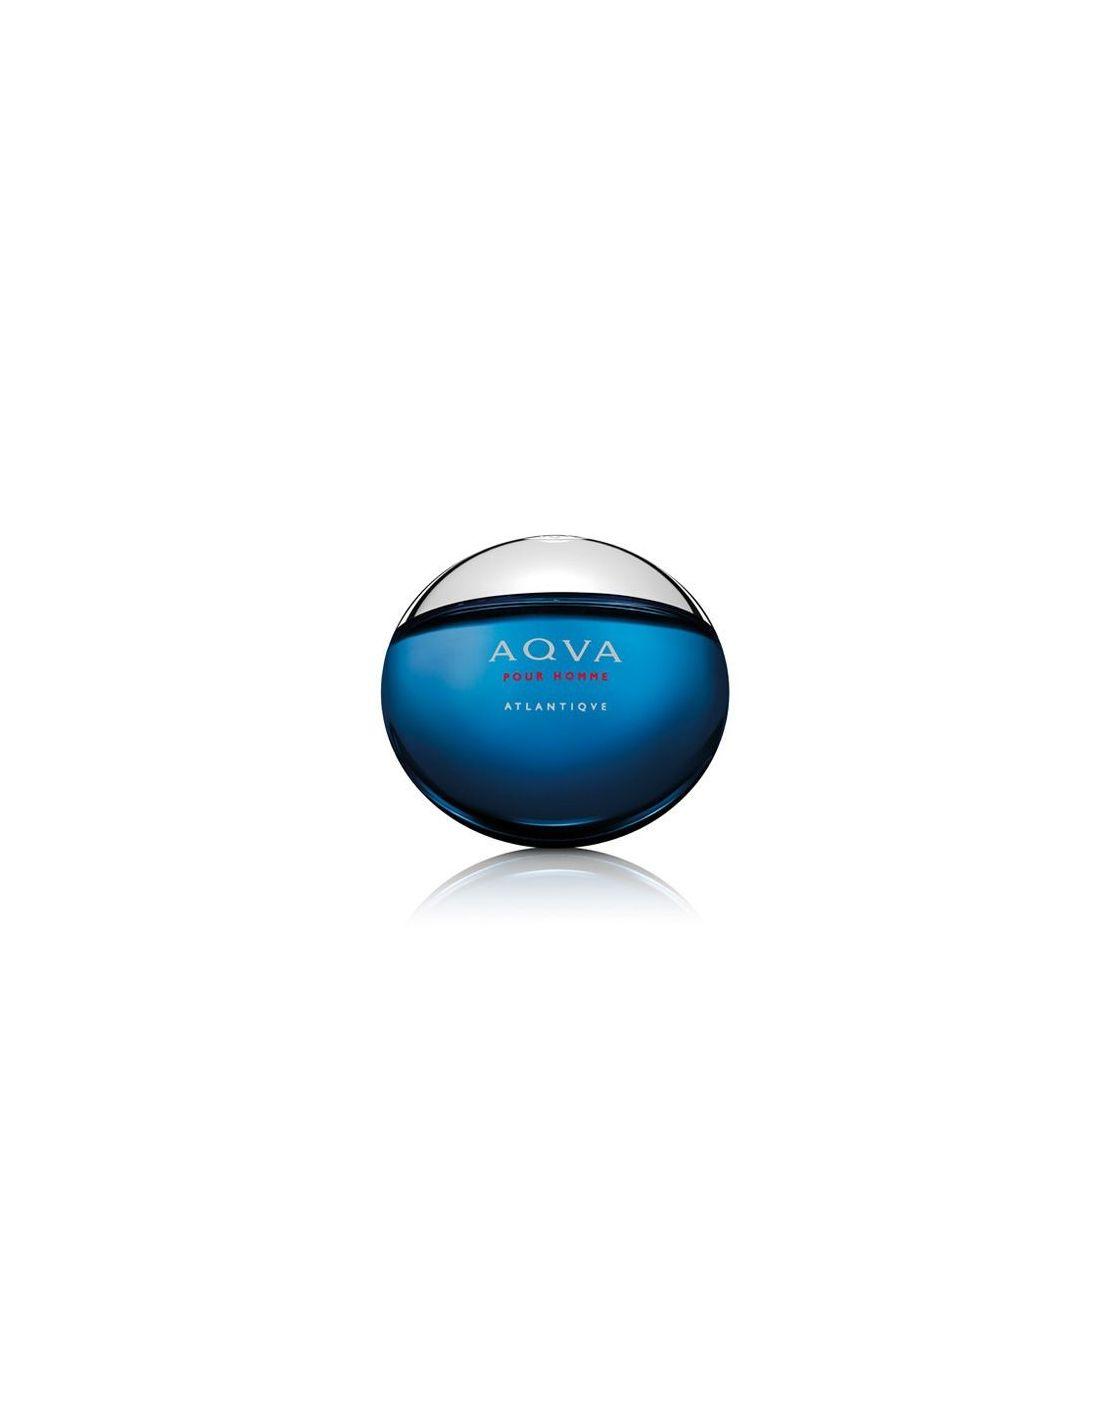 Bvlgari Aqva Pour Homme Atlantiqve Eau de Toilette 50ml - Perfumes 24 ®. bb022dd11f